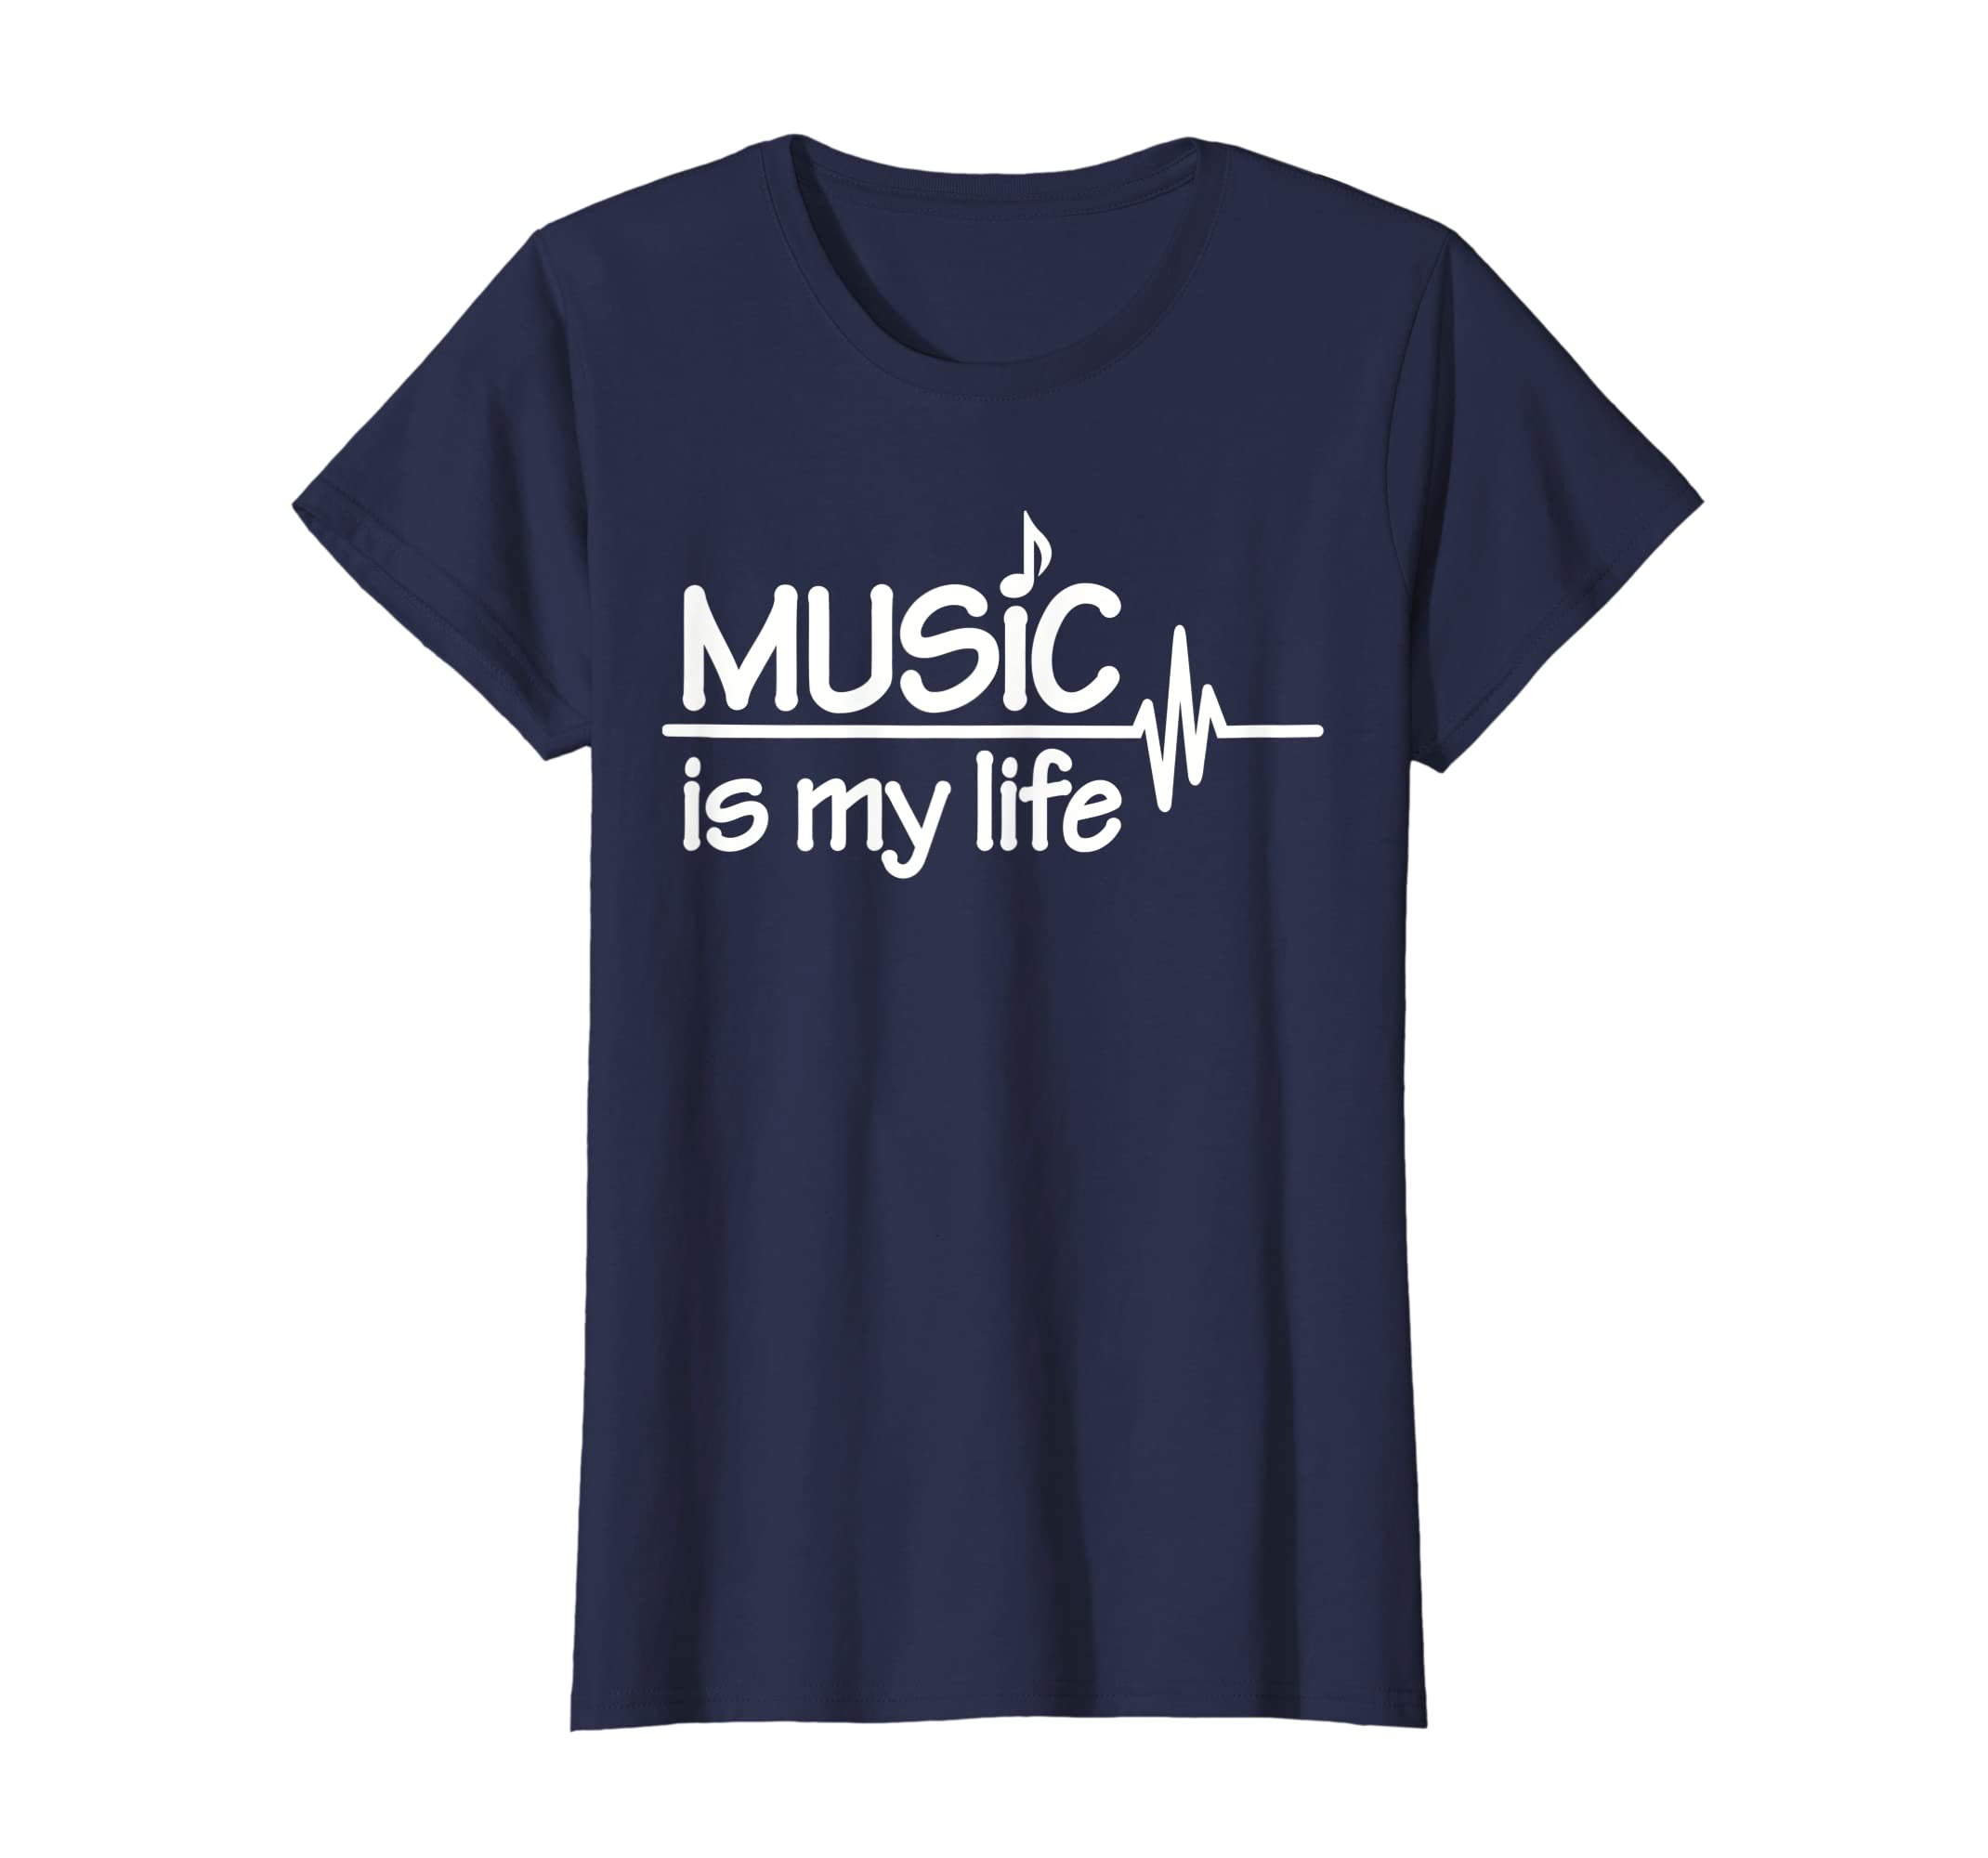 6e81ba5a Amazon.com: Music is my life T-Shirt: Clothing